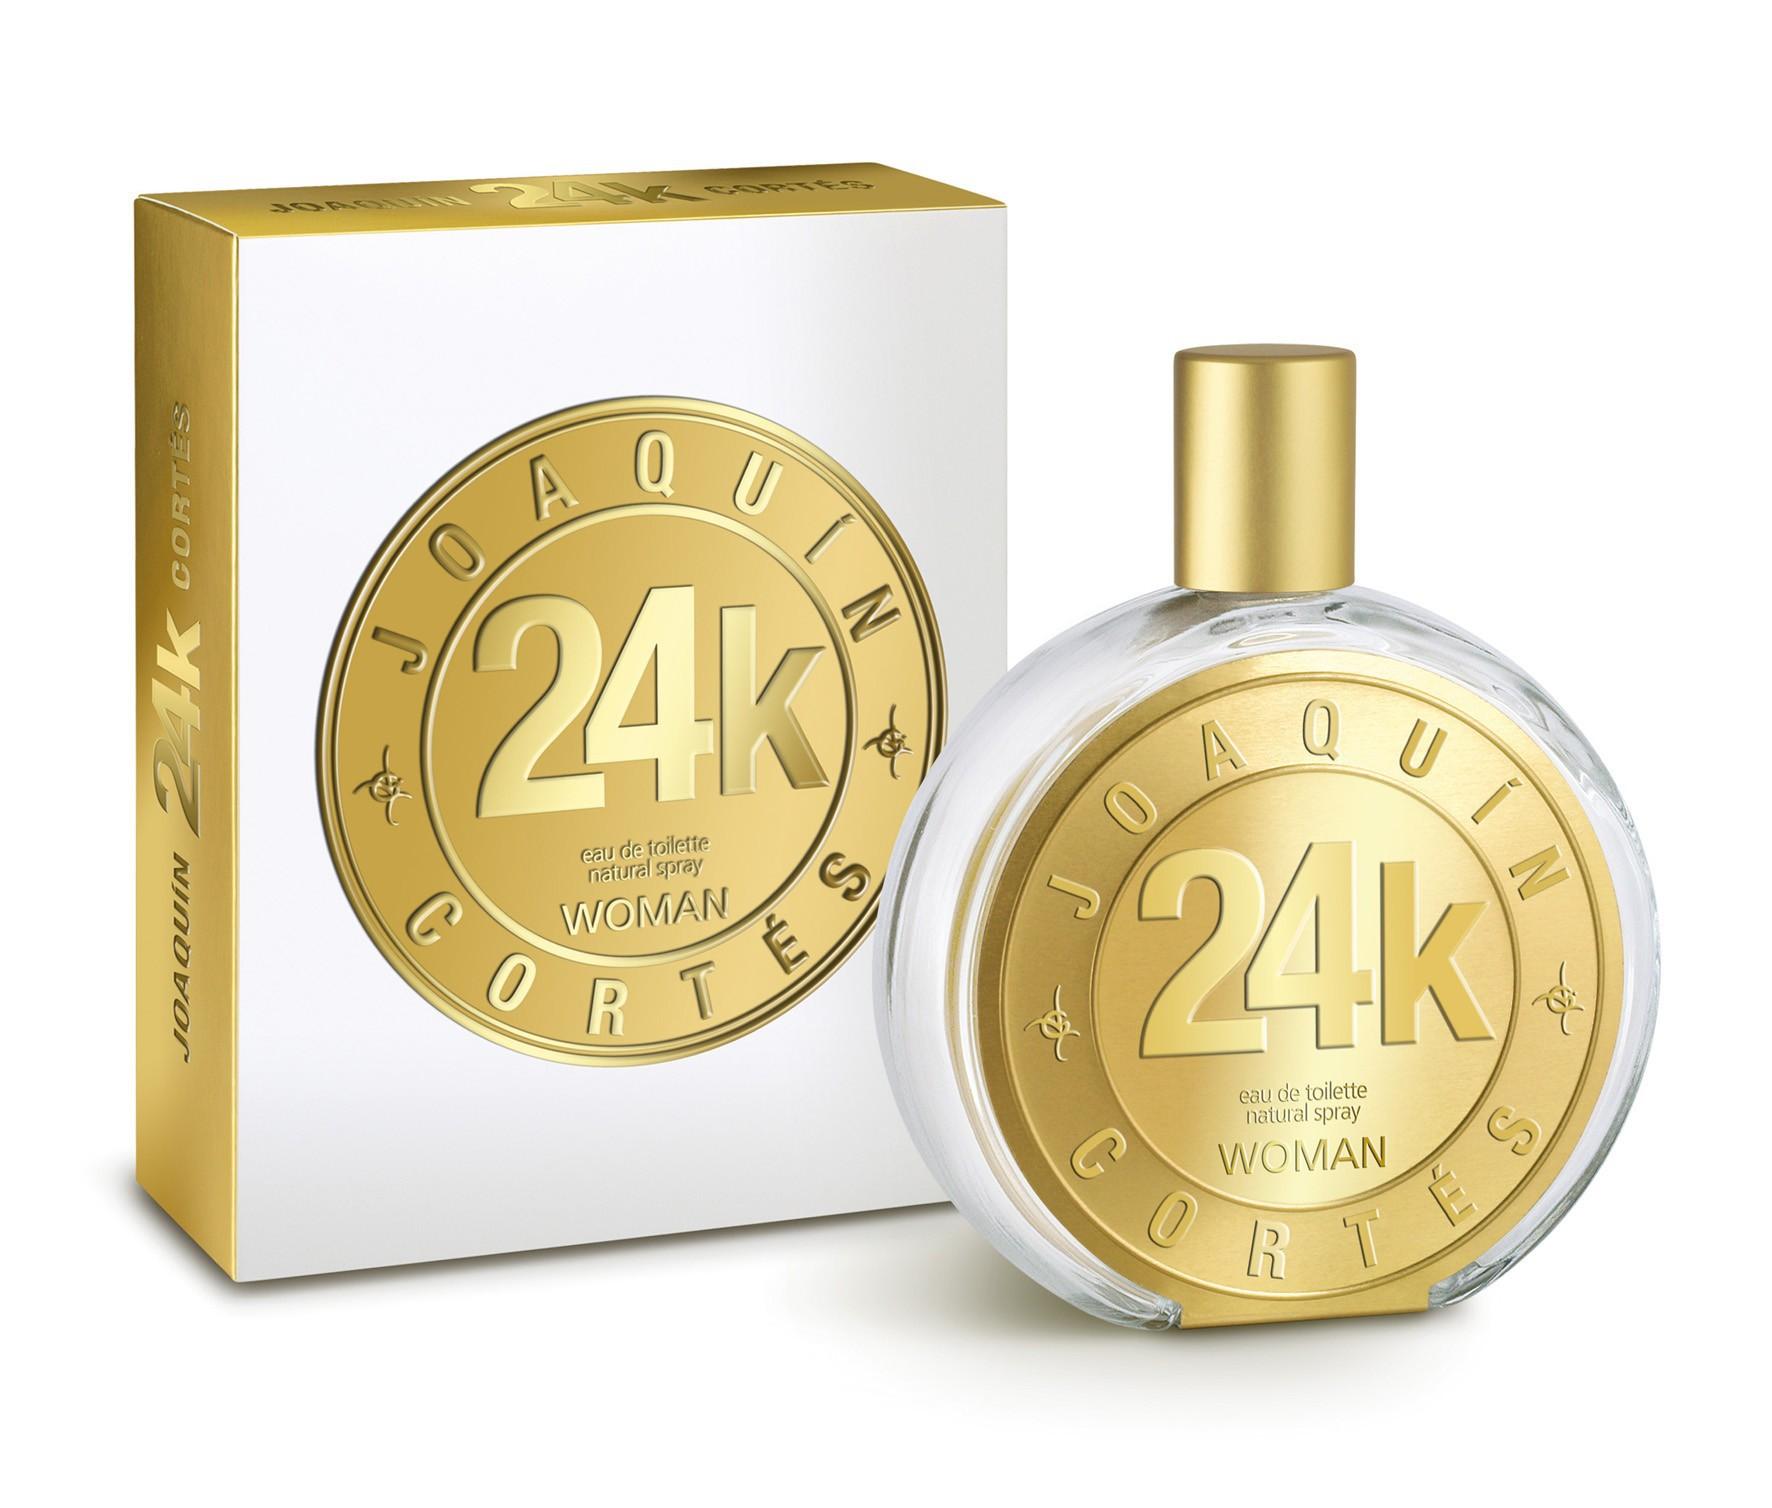 Joaquin Cortes 24k Woman аромат для женщин